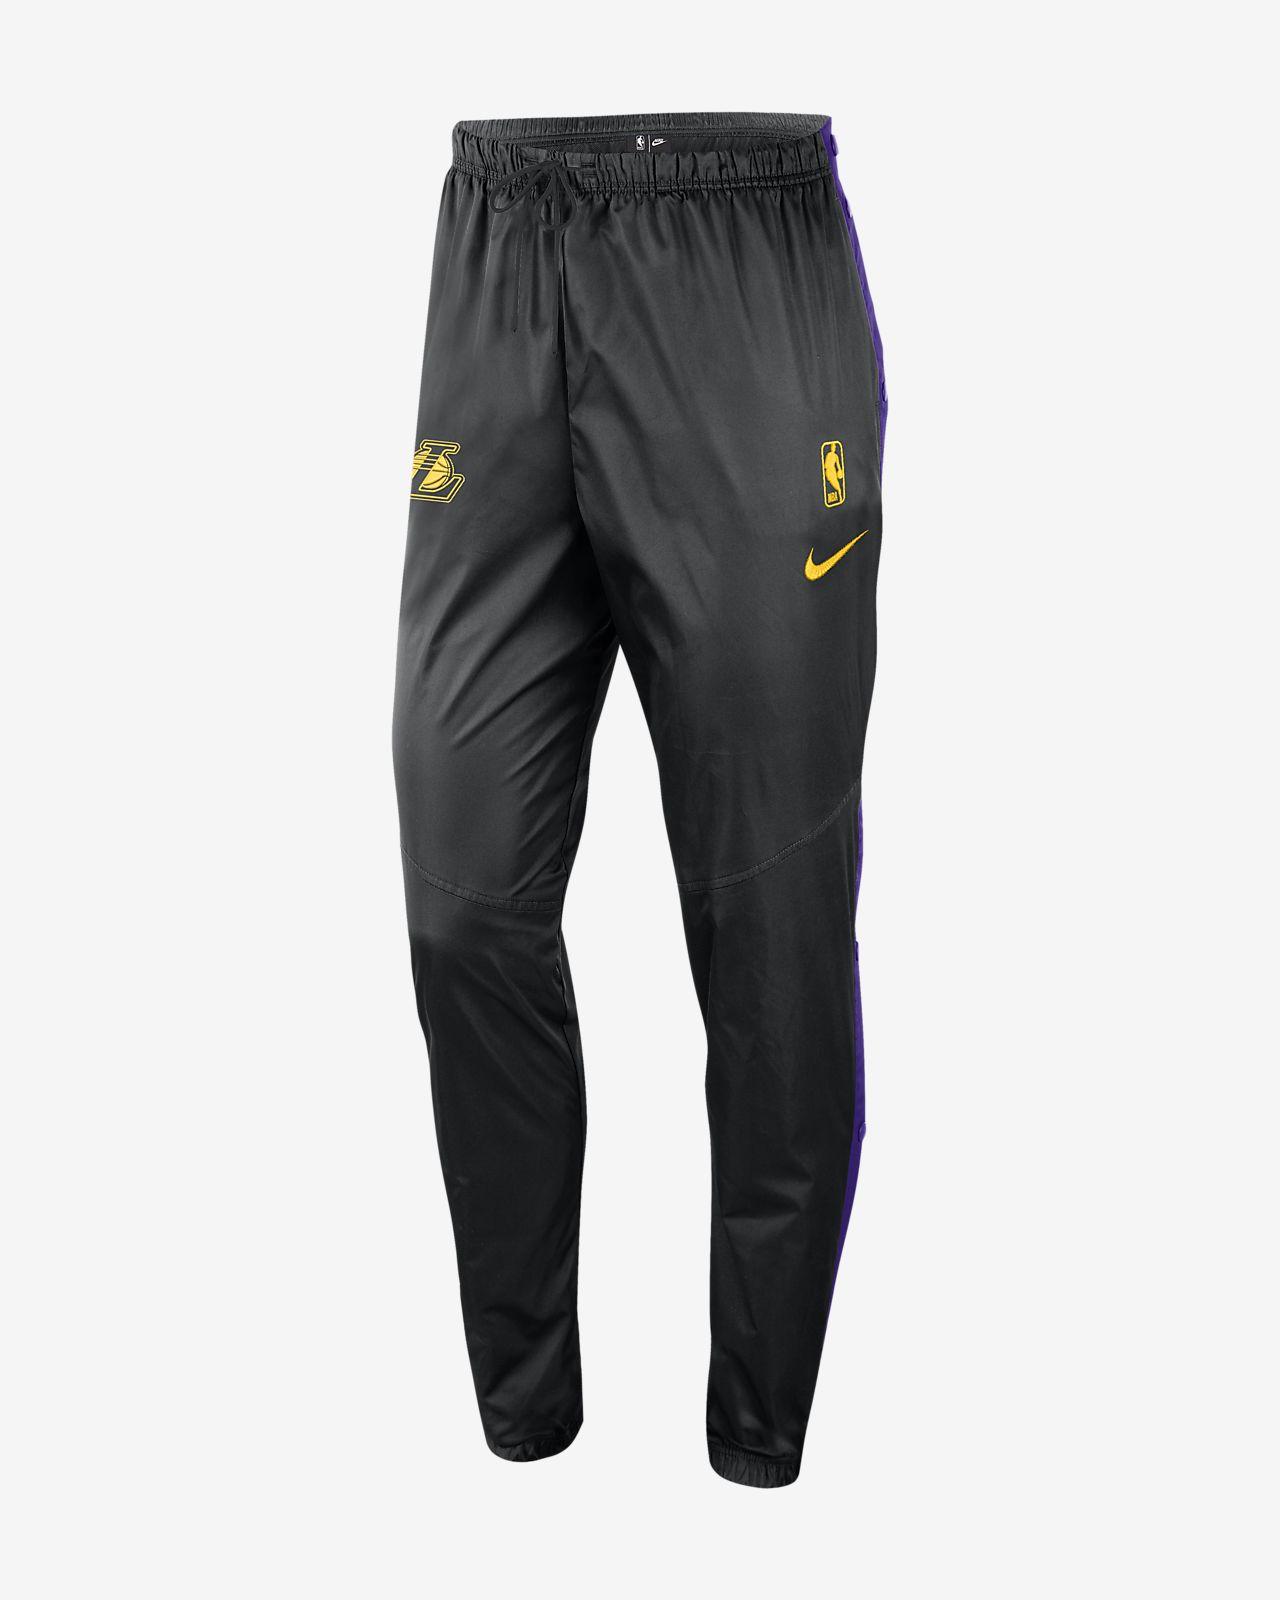 Pantalones de la NBA para mujer Los Angeles Lakers Nike